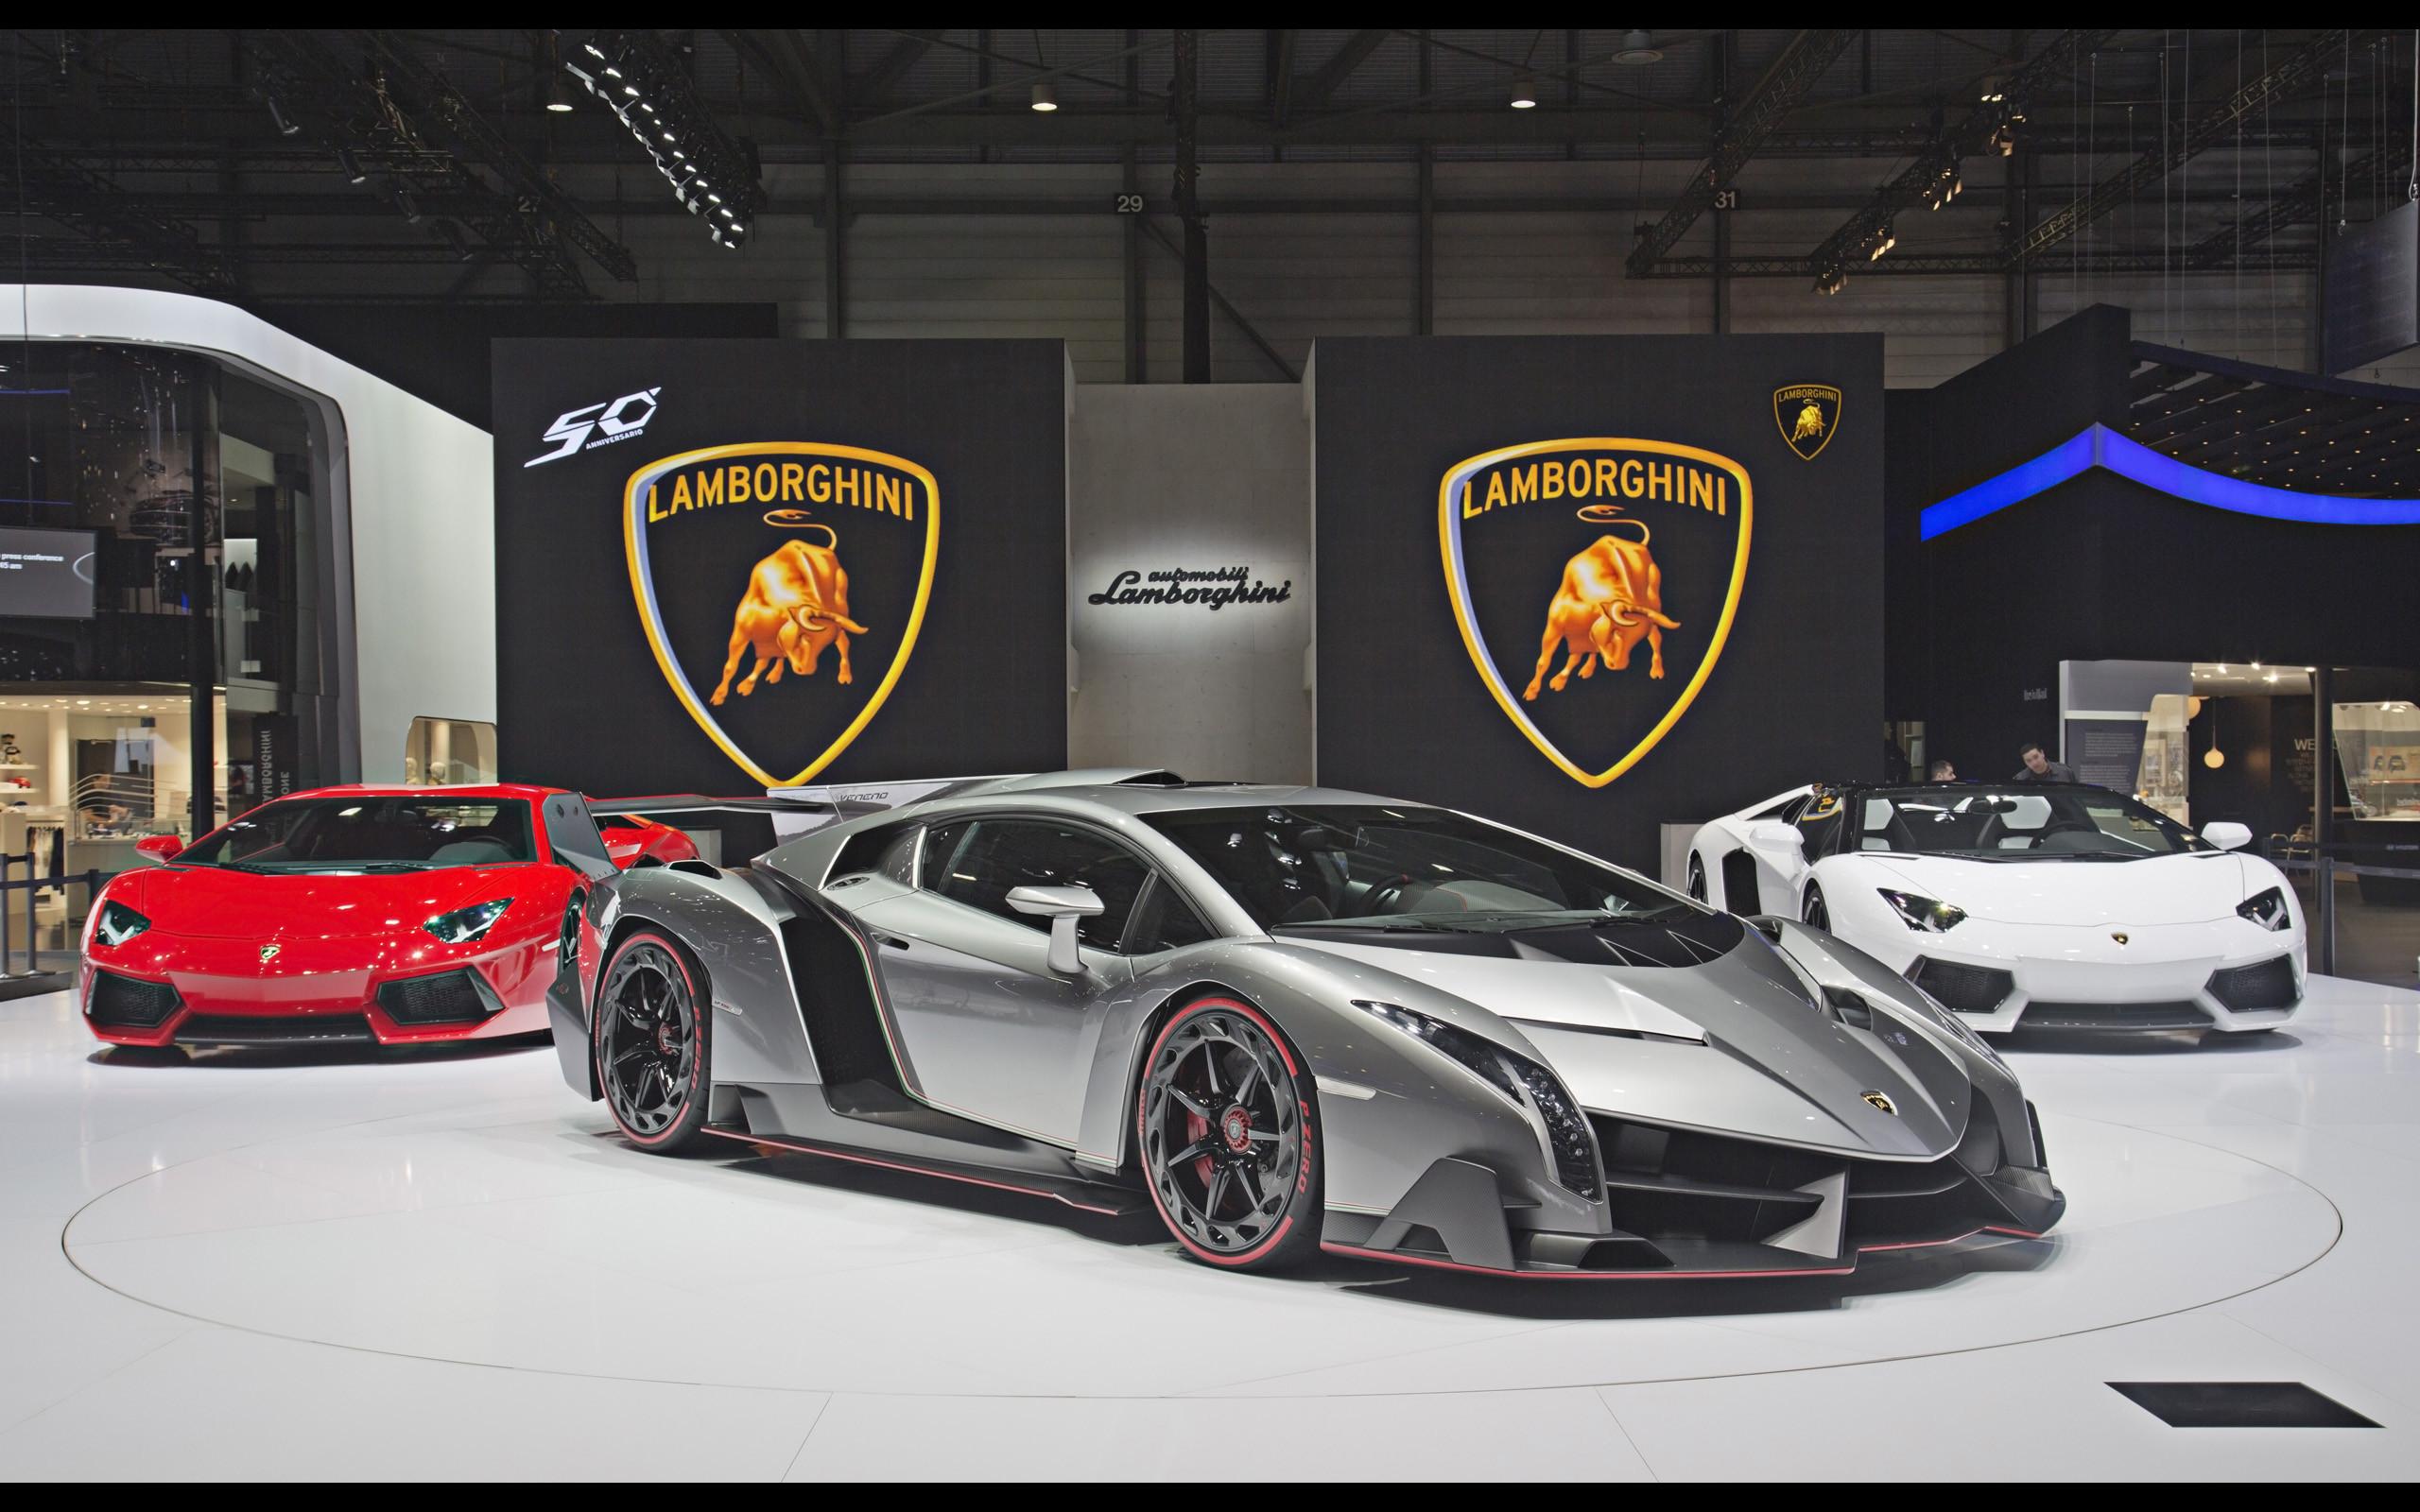 2013 Lamborghini Veneno supercar supercars g wallpaper | | 130166  | WallpaperUP